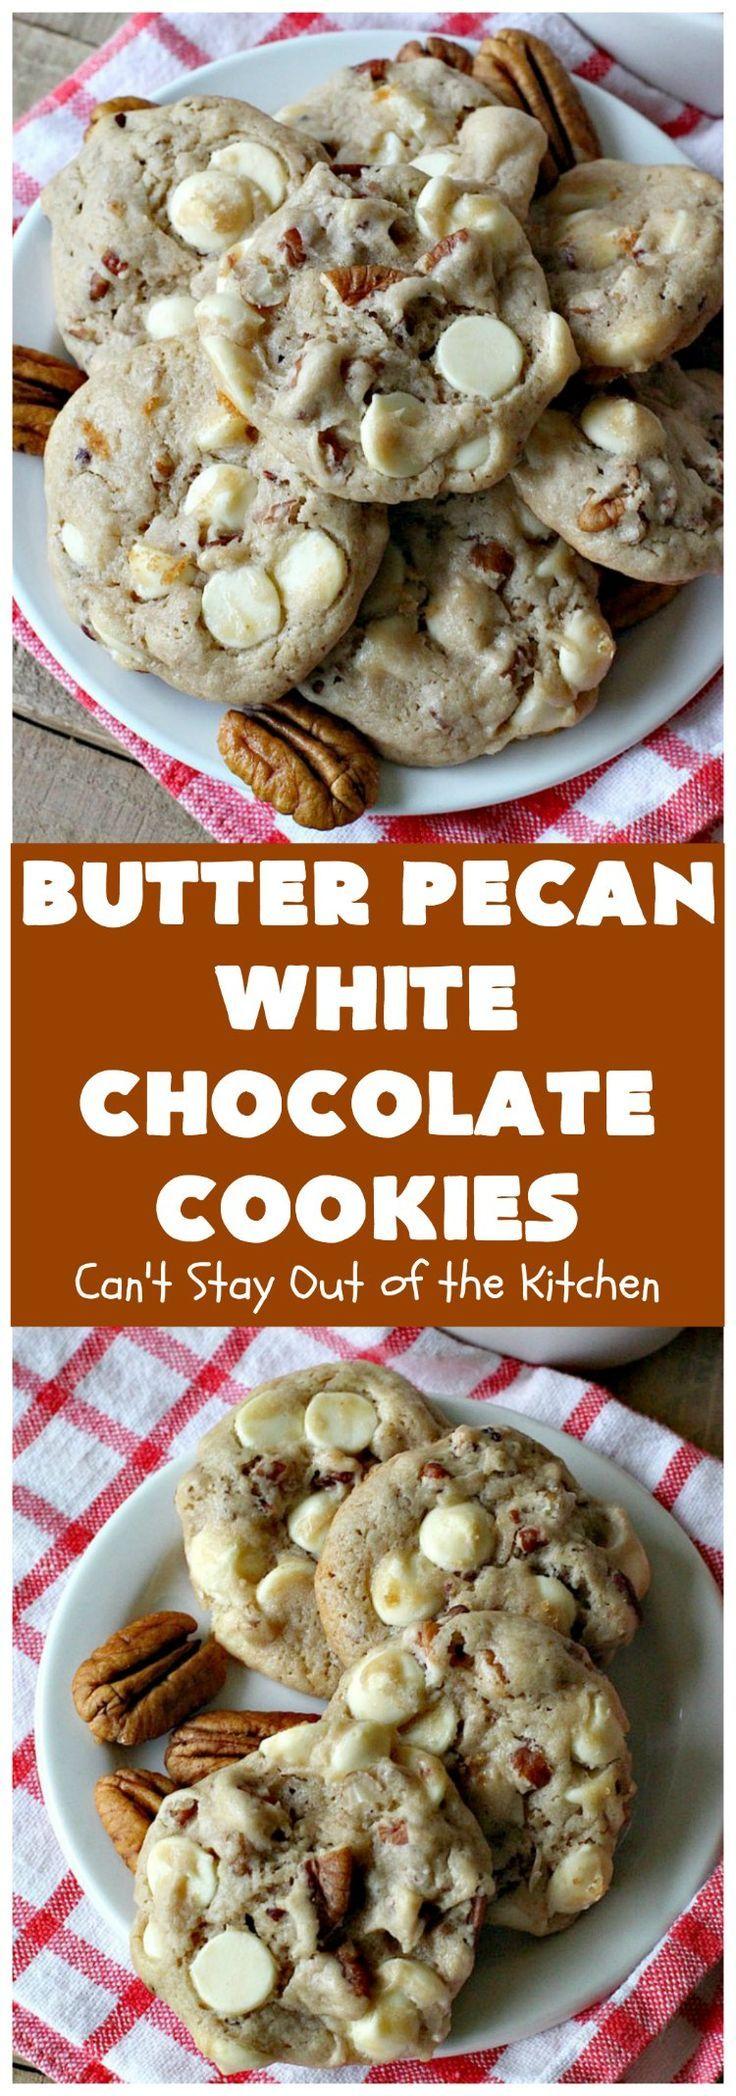 Butter pecan white chocolate cookies white chocolate